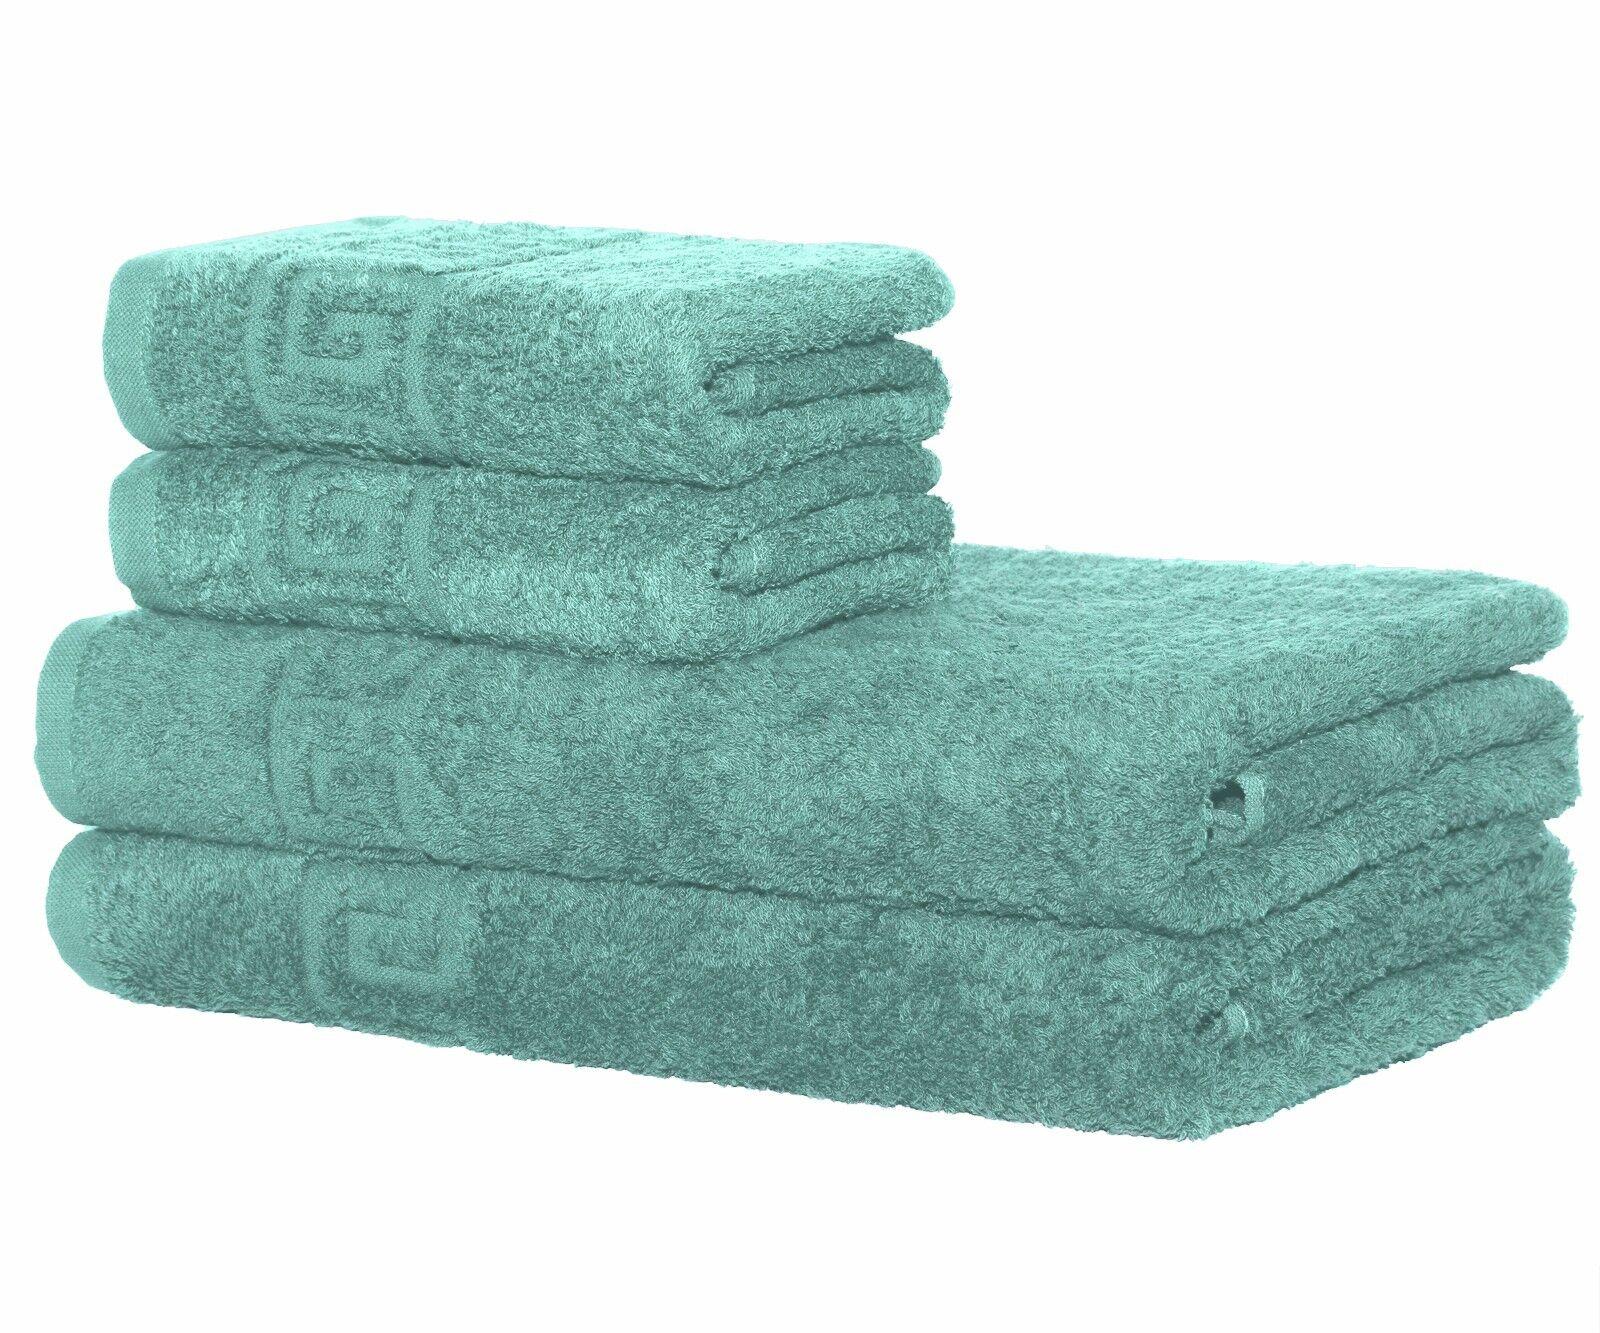 Towels Set 2 Bath or 2 Hand Towels  100% Cotton